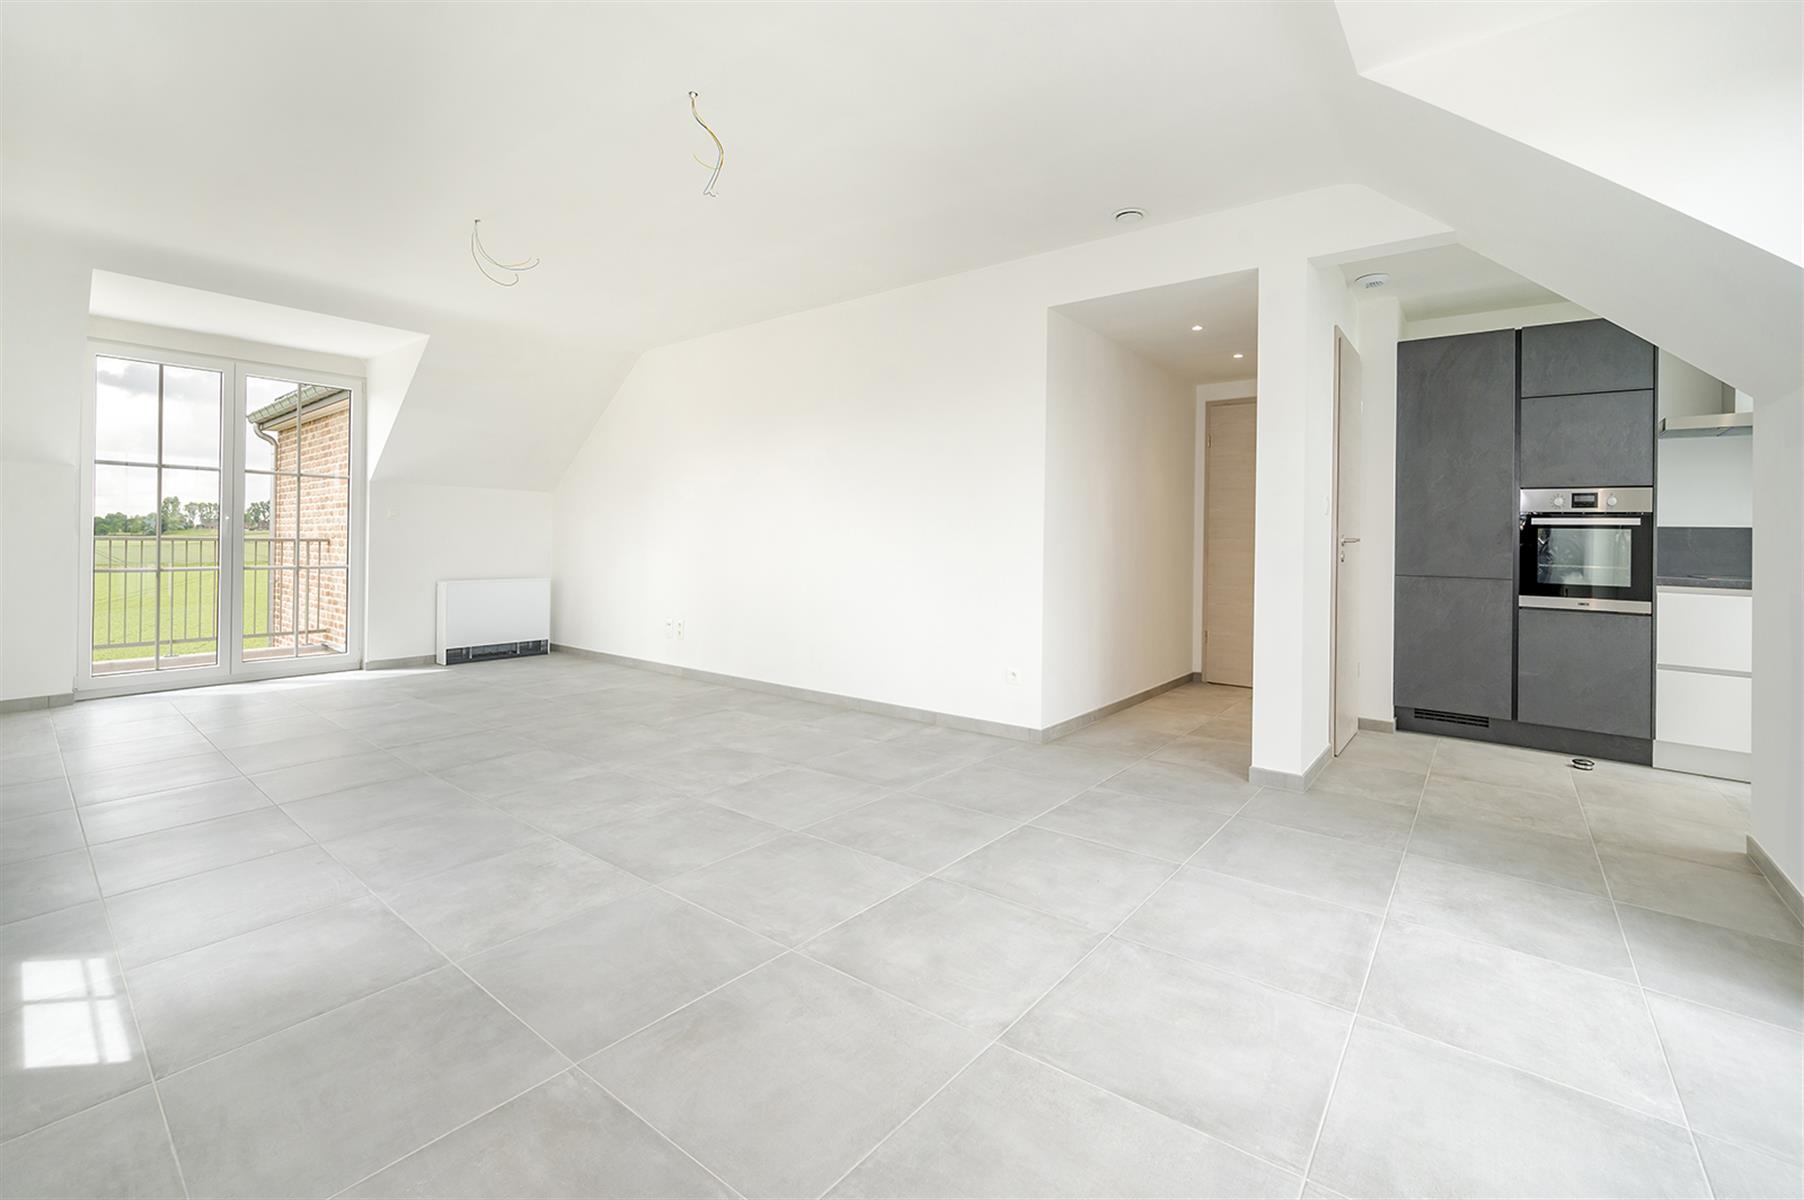 Appartement avec jardin - Huy - #3807166-6